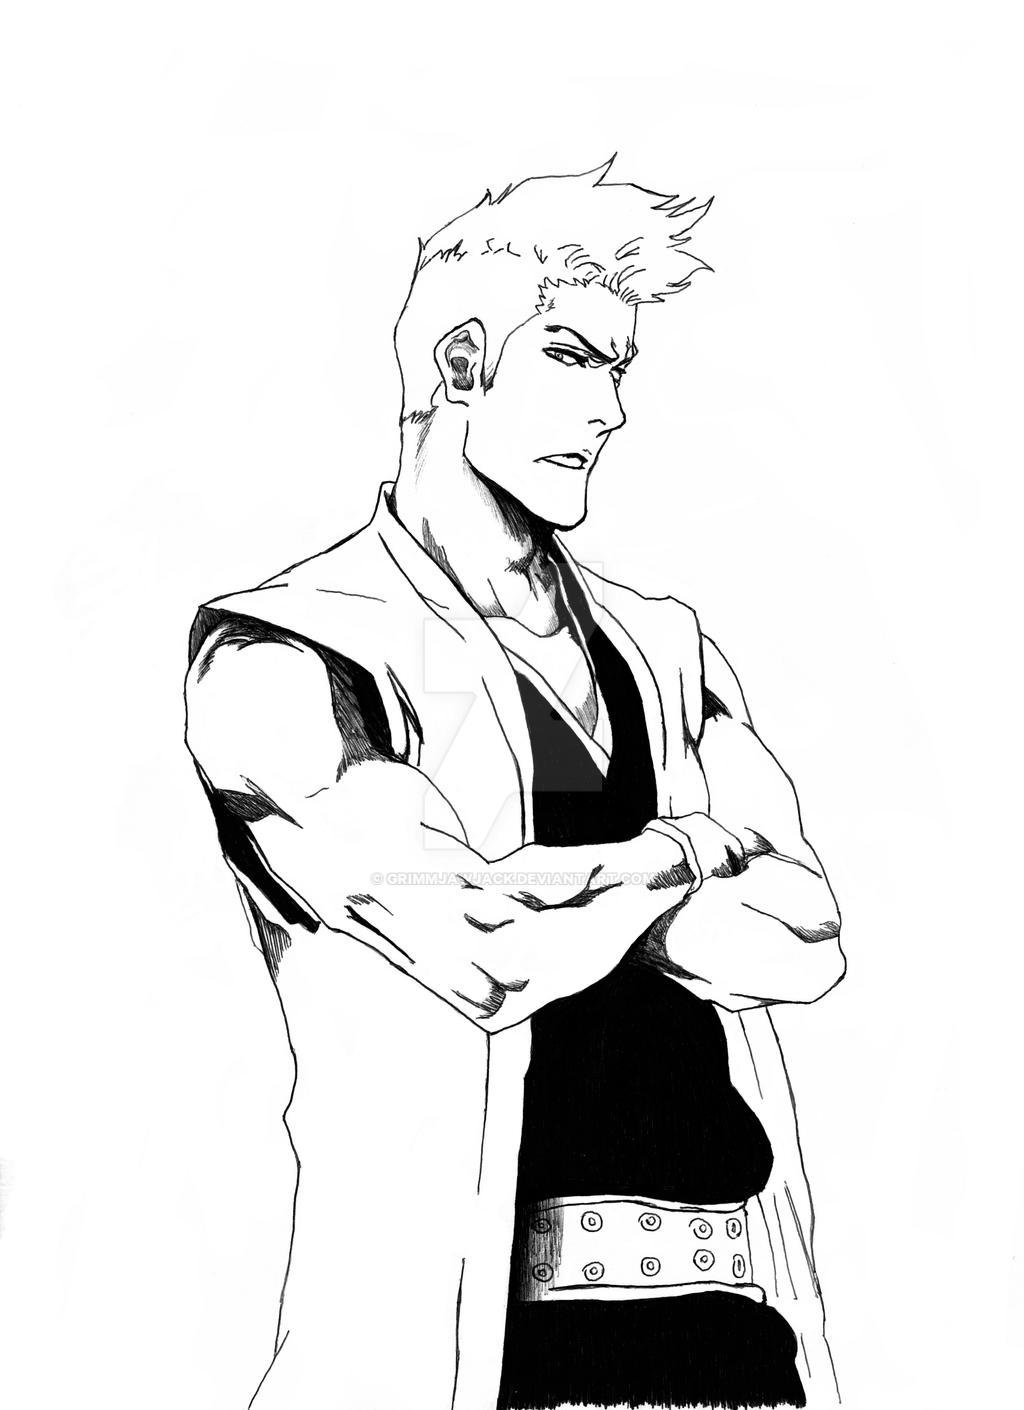 Bleach:: Kensei Muguruma by Rumbera4evar on DeviantArt